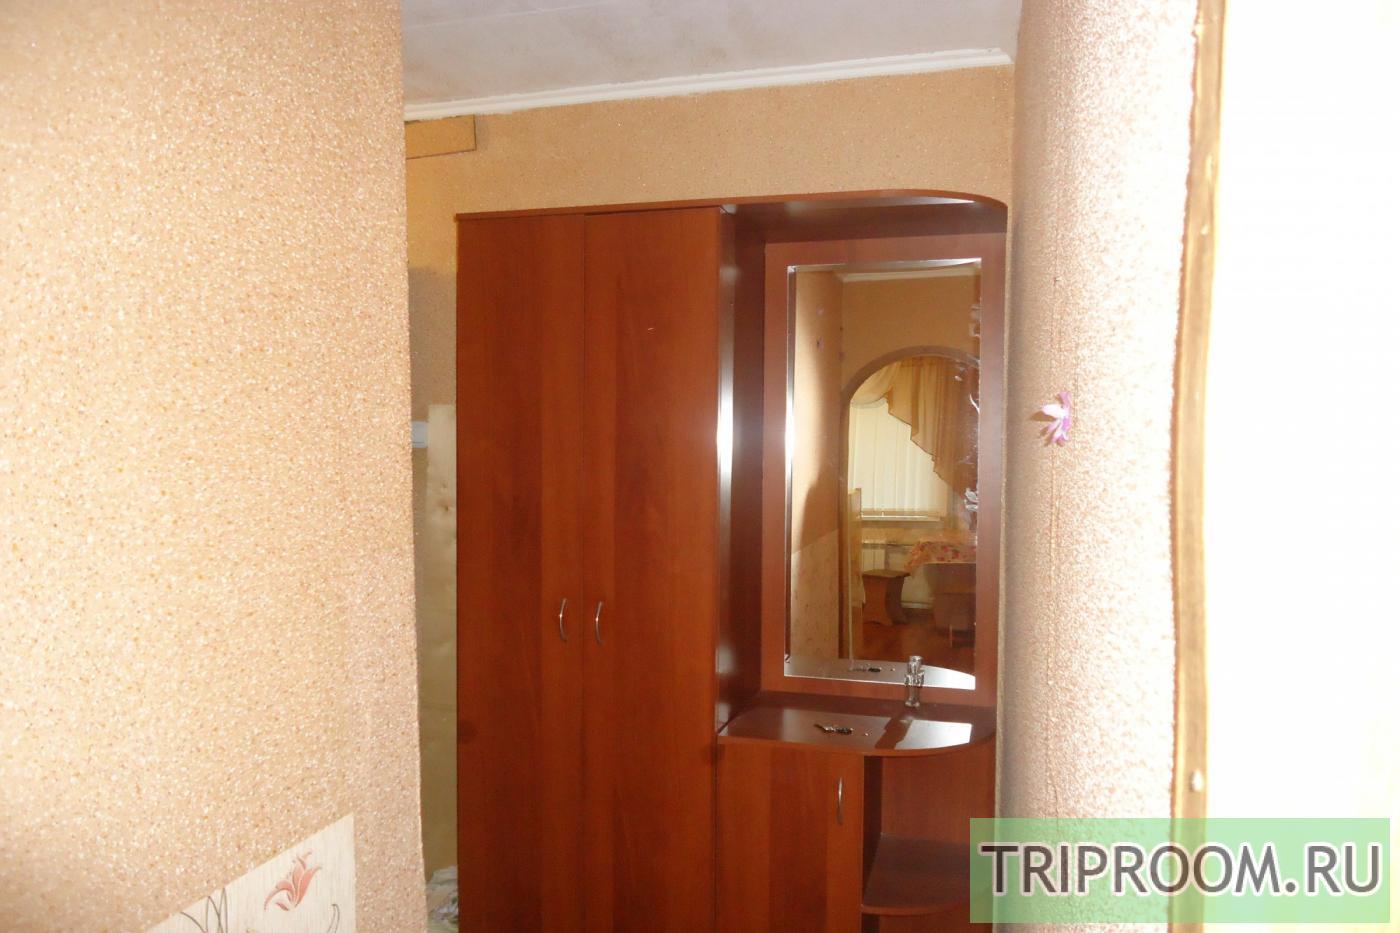 1-комнатная квартира посуточно (вариант № 21212), ул. Лебедева-Лумача улица, фото № 5